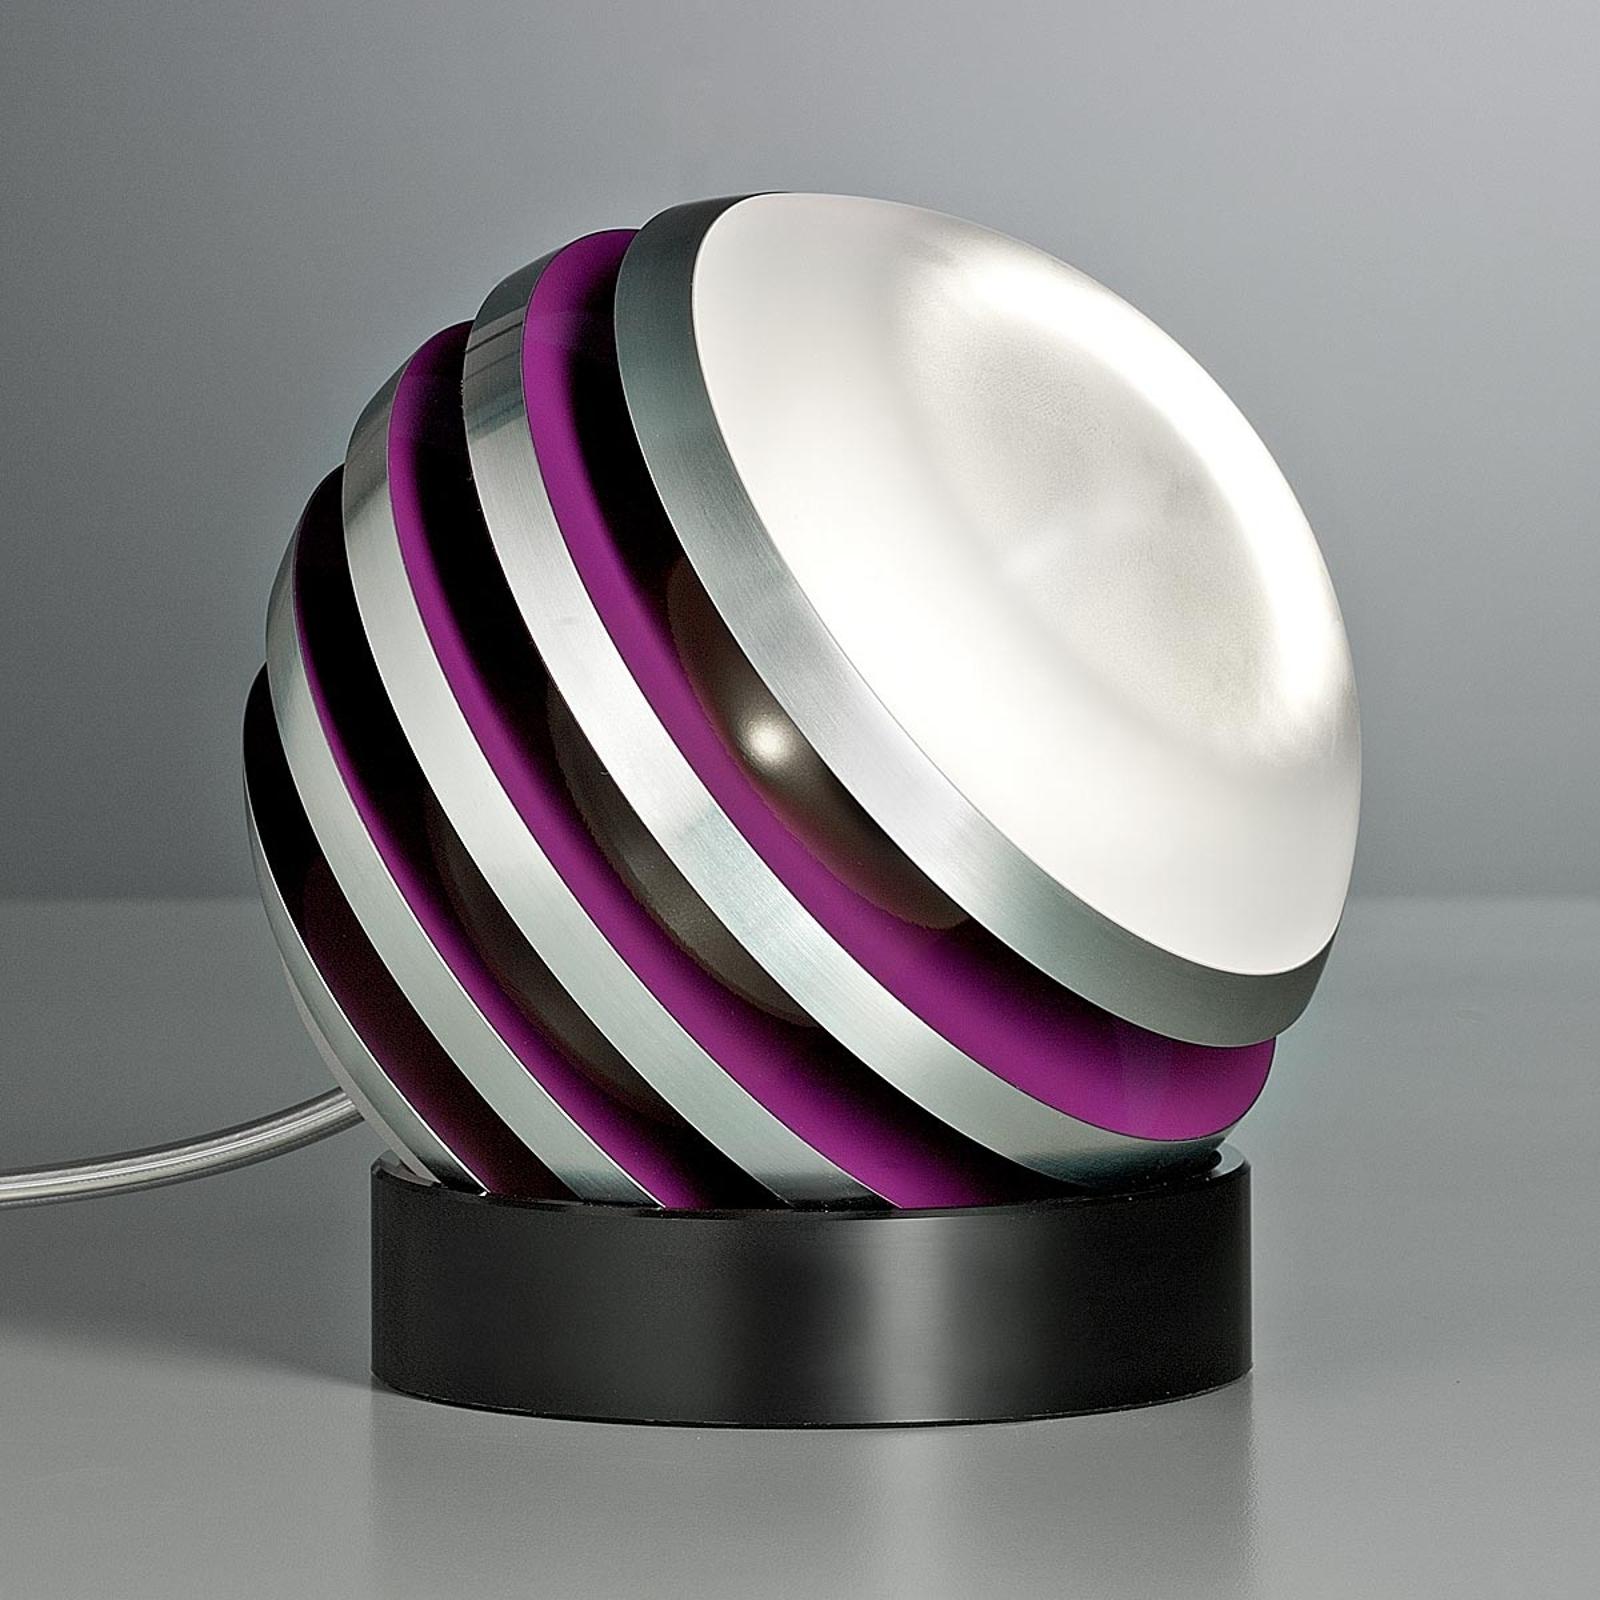 Originele led-tafellamp BULO, aardbei